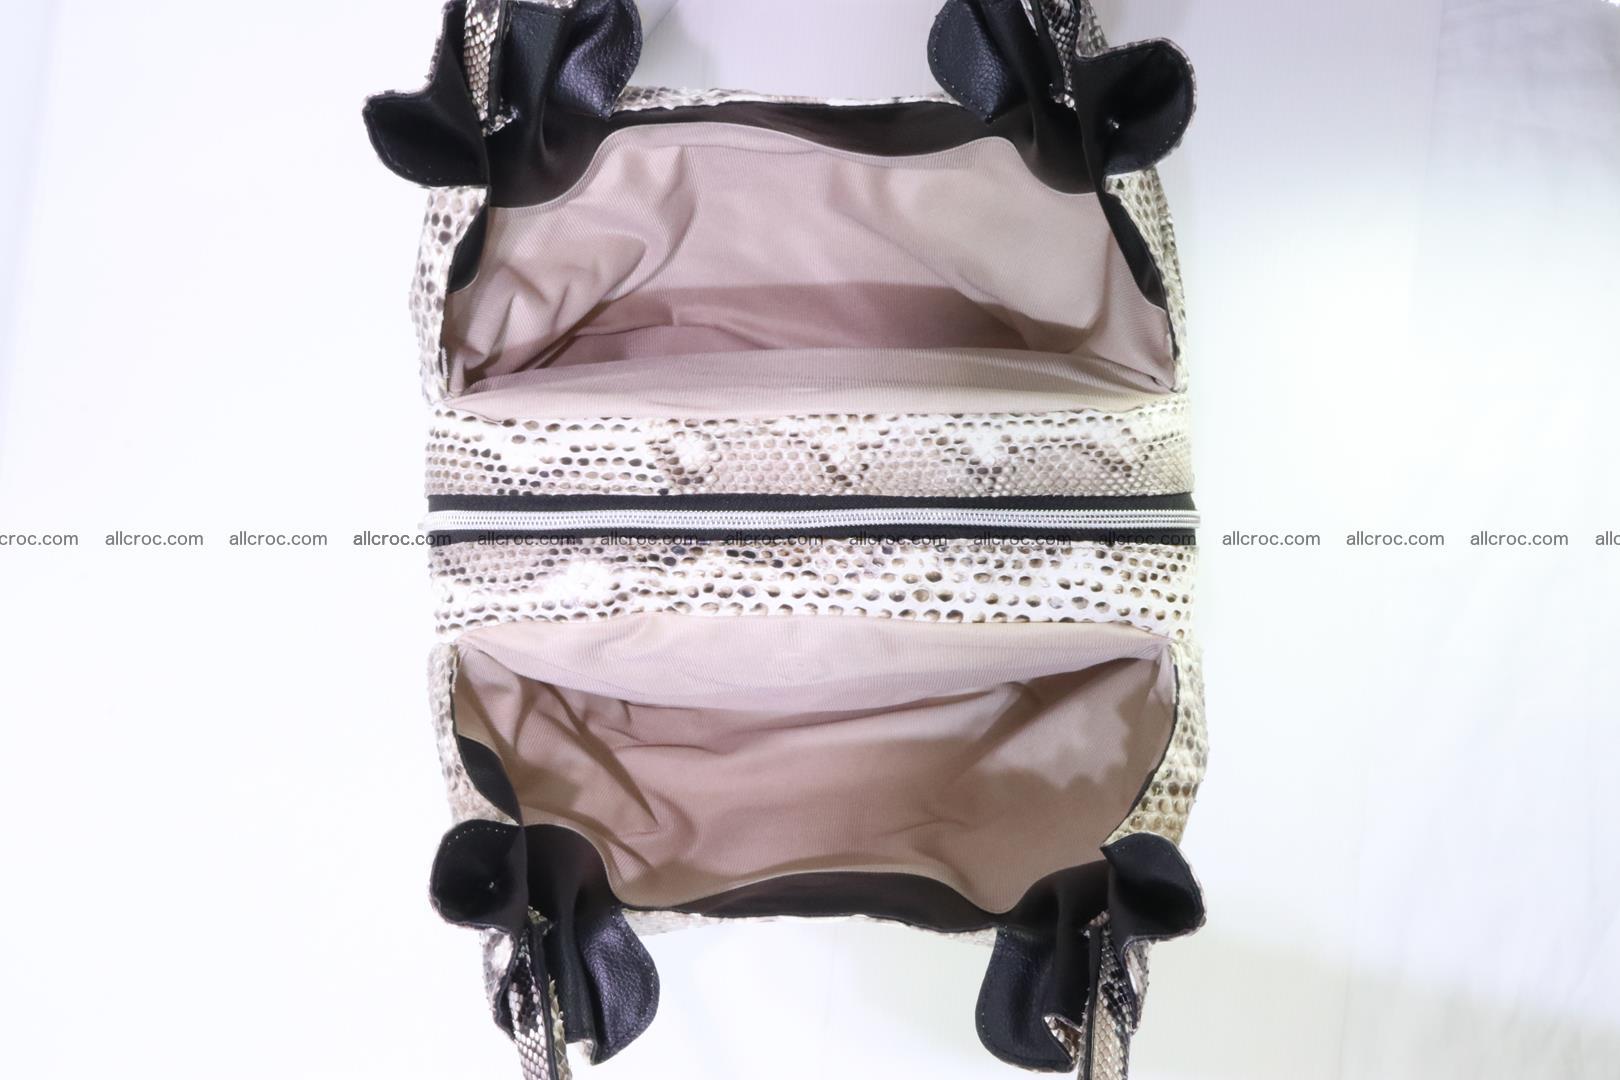 Python skin handbag for lady from genuine Python skin 198 Foto 10